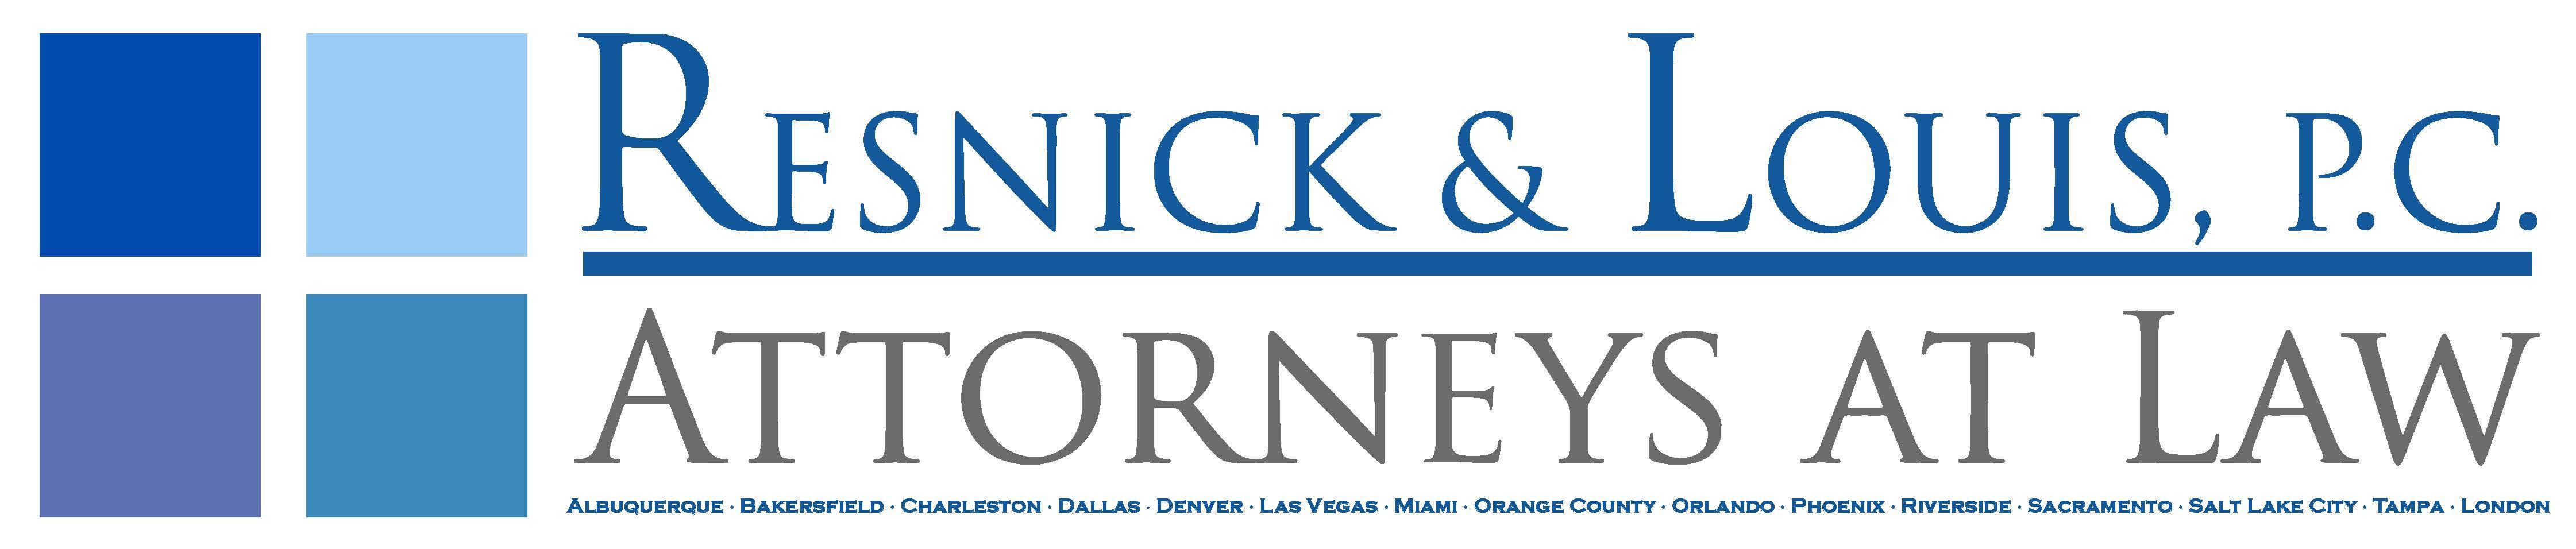 Resnick Louis New Logo_STATES